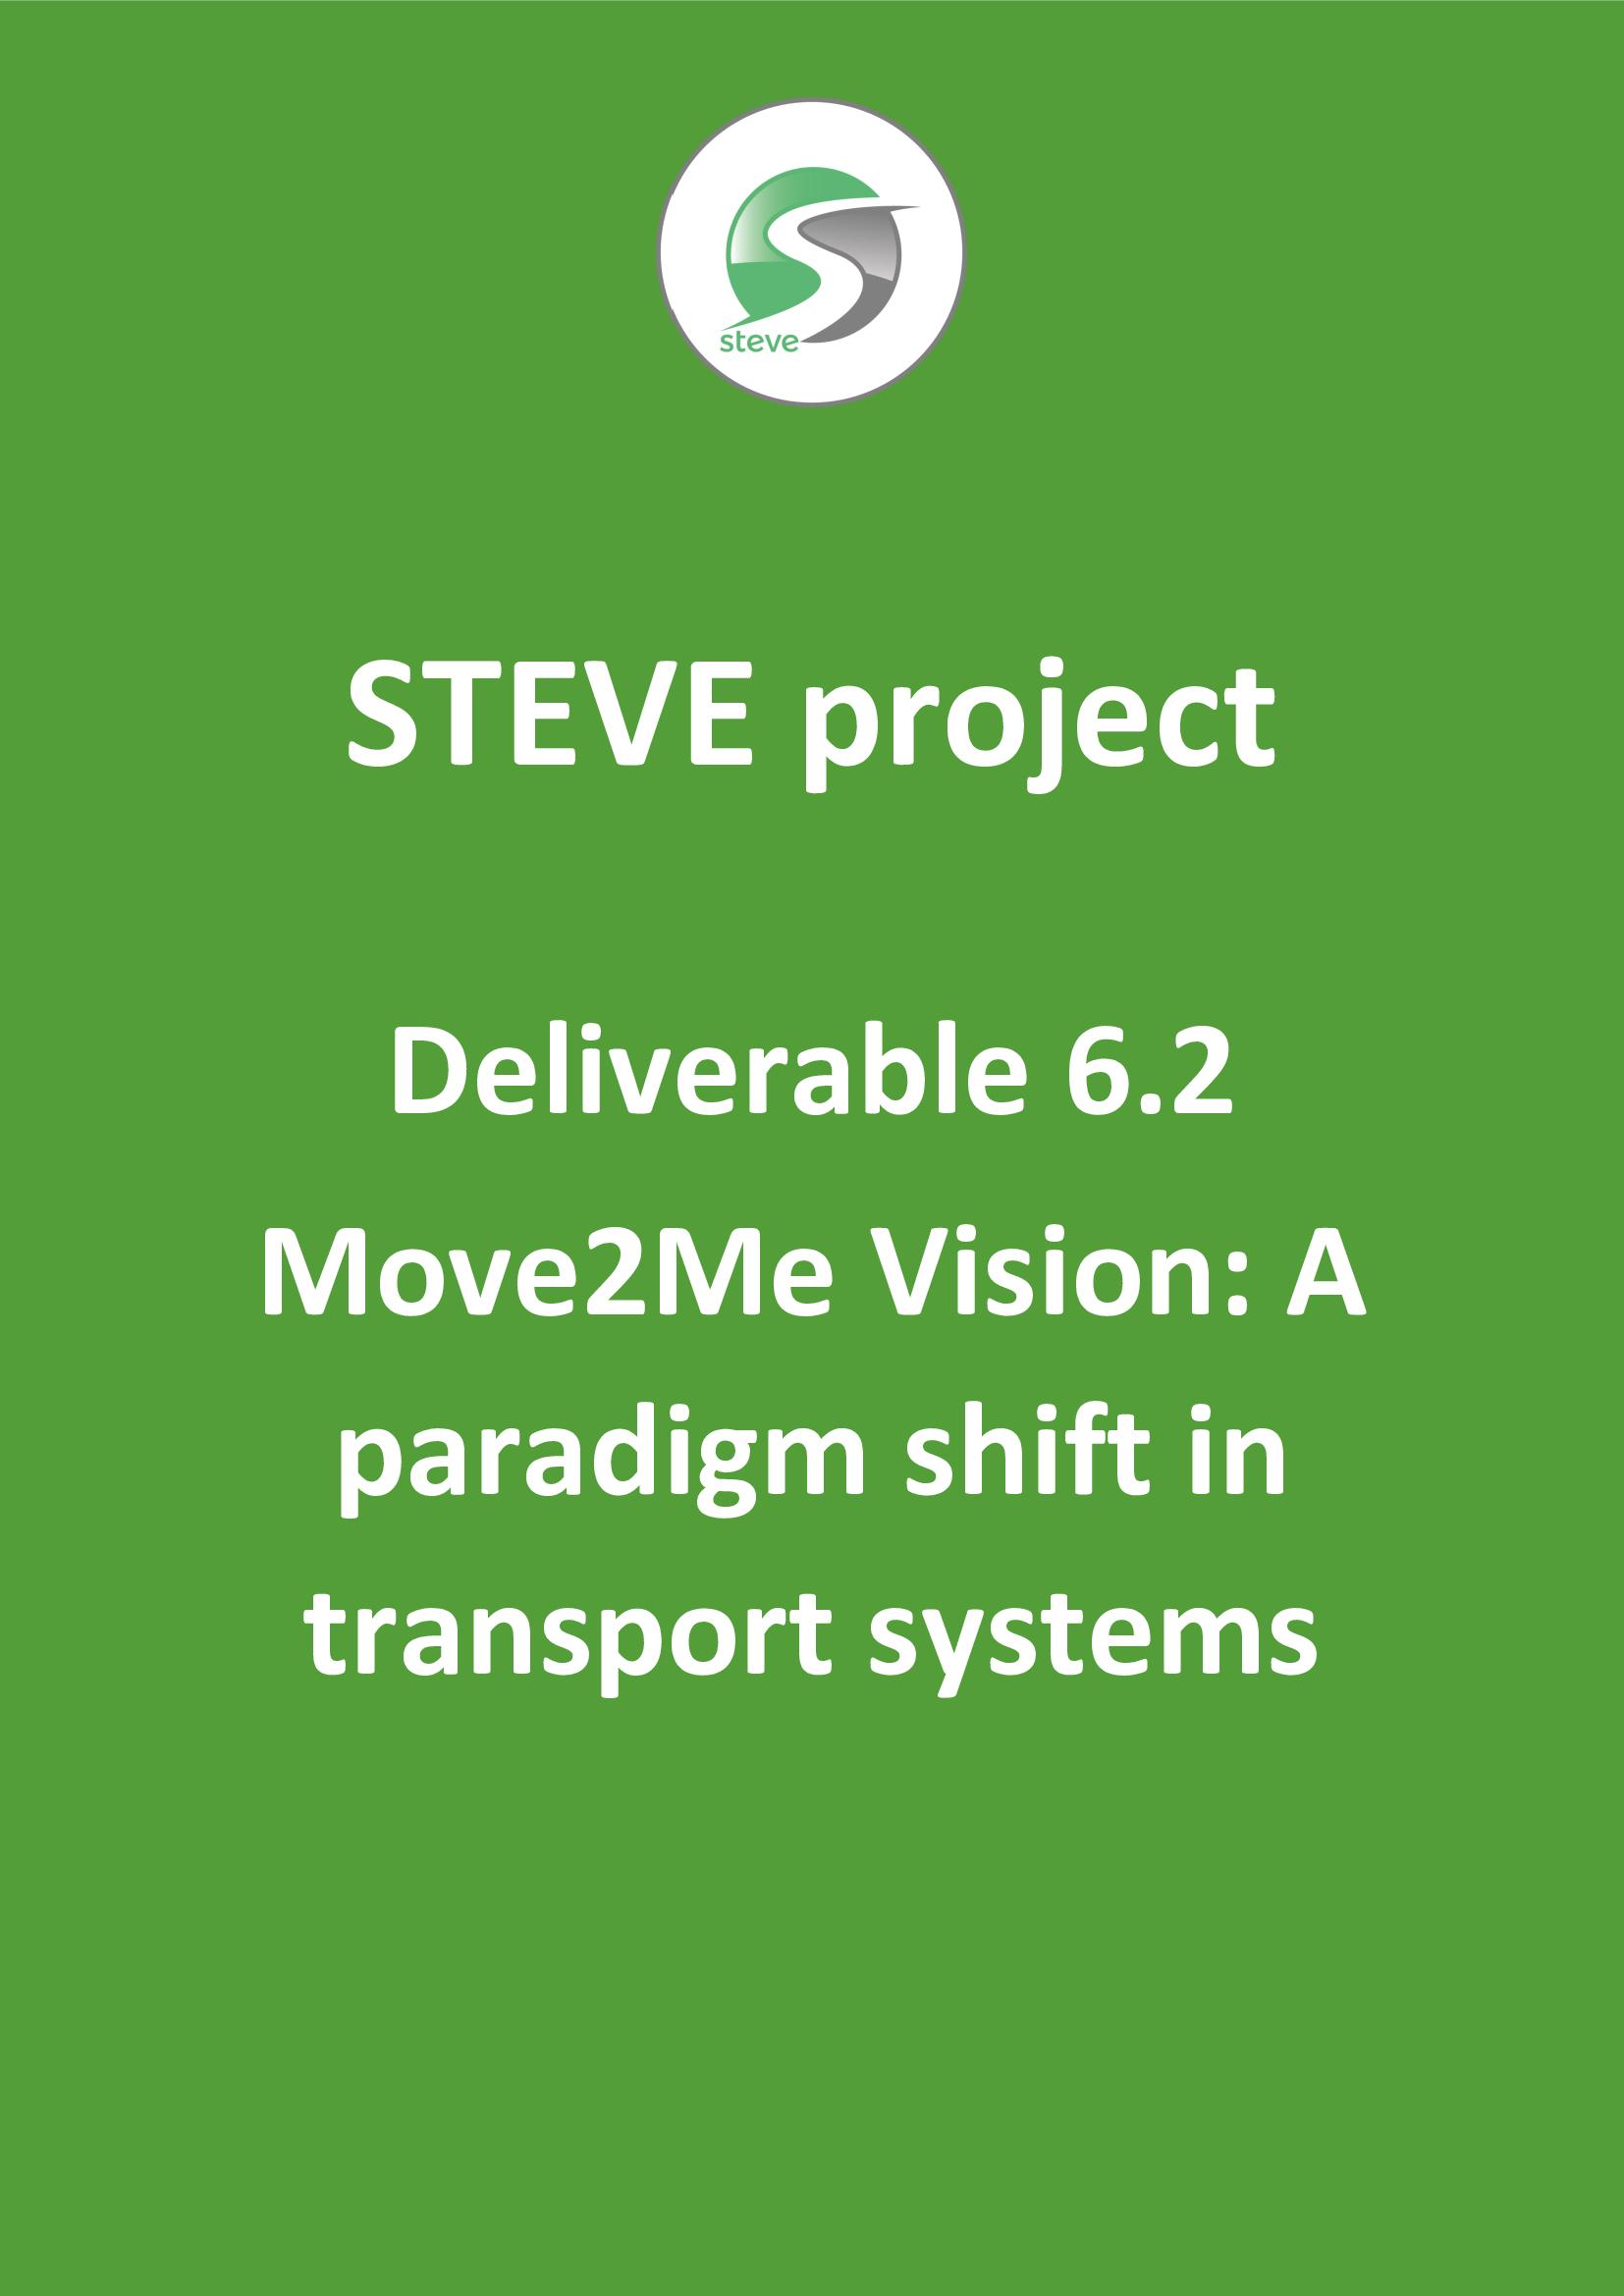 Deliverable 6.2